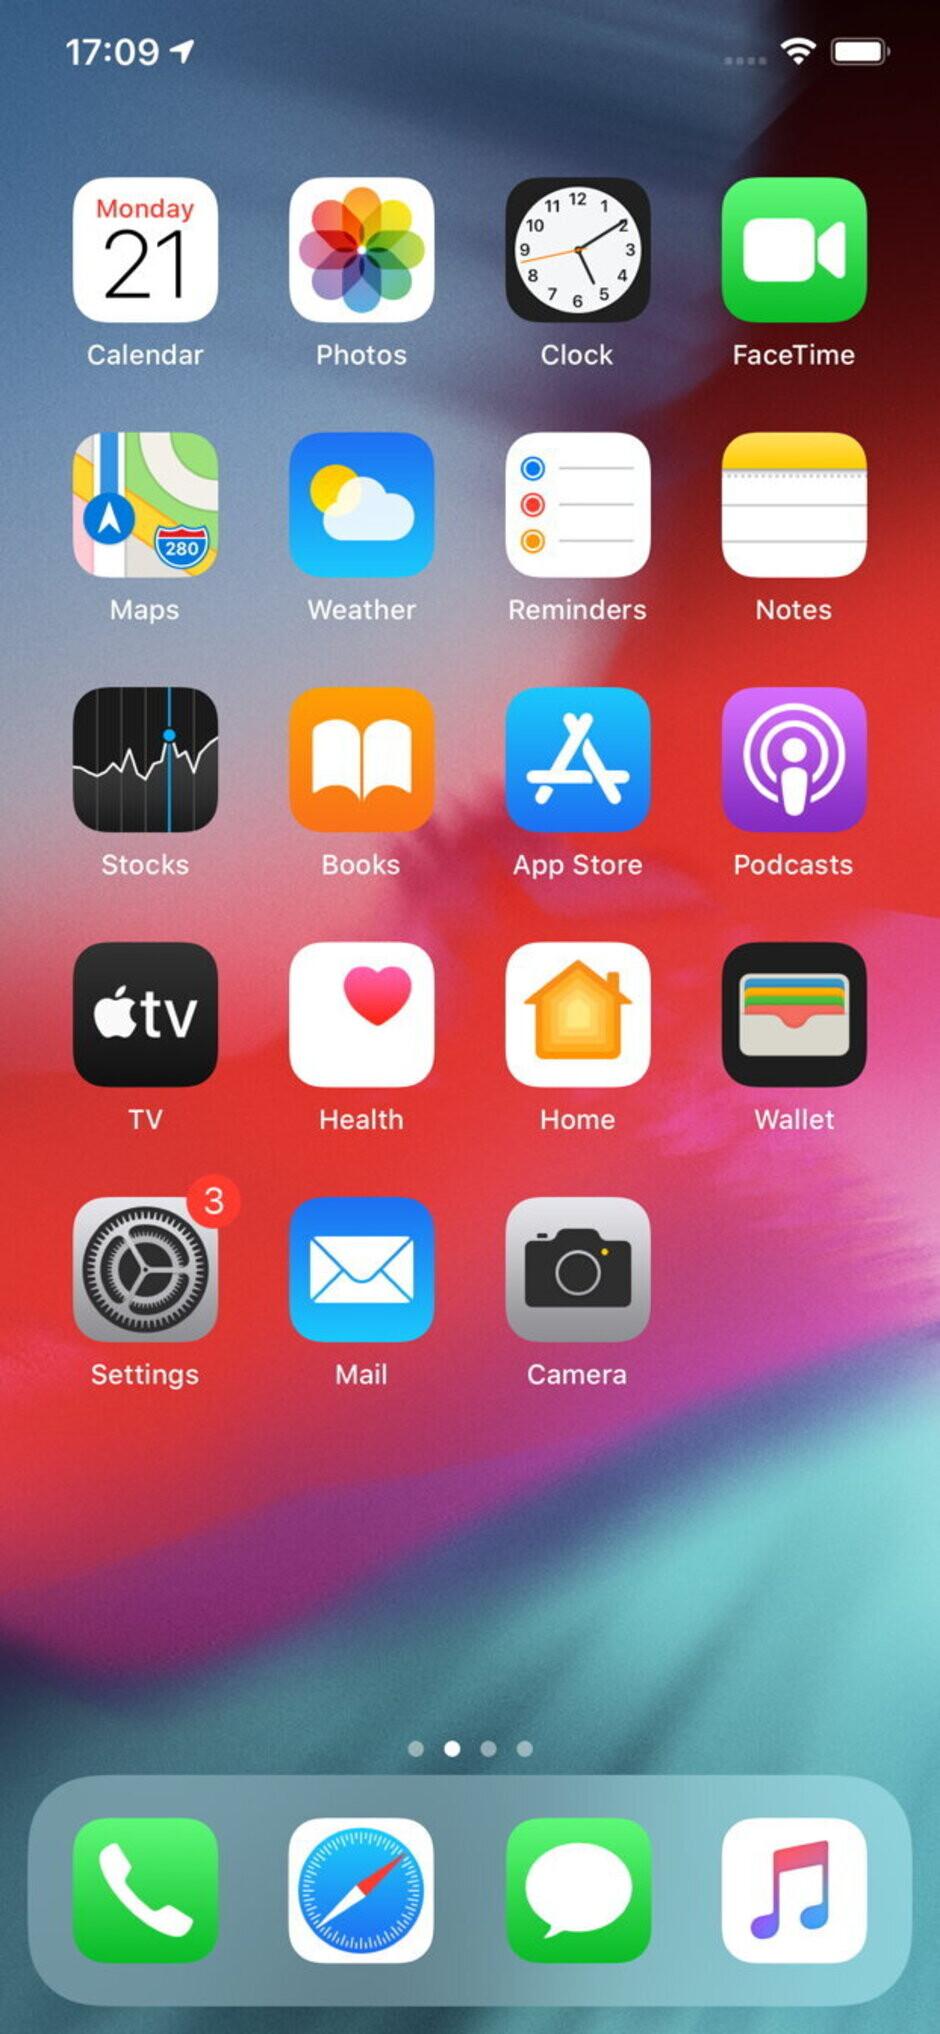 iOS 13 - iPhone 11 Pro Max vs Galaxy Note 10+